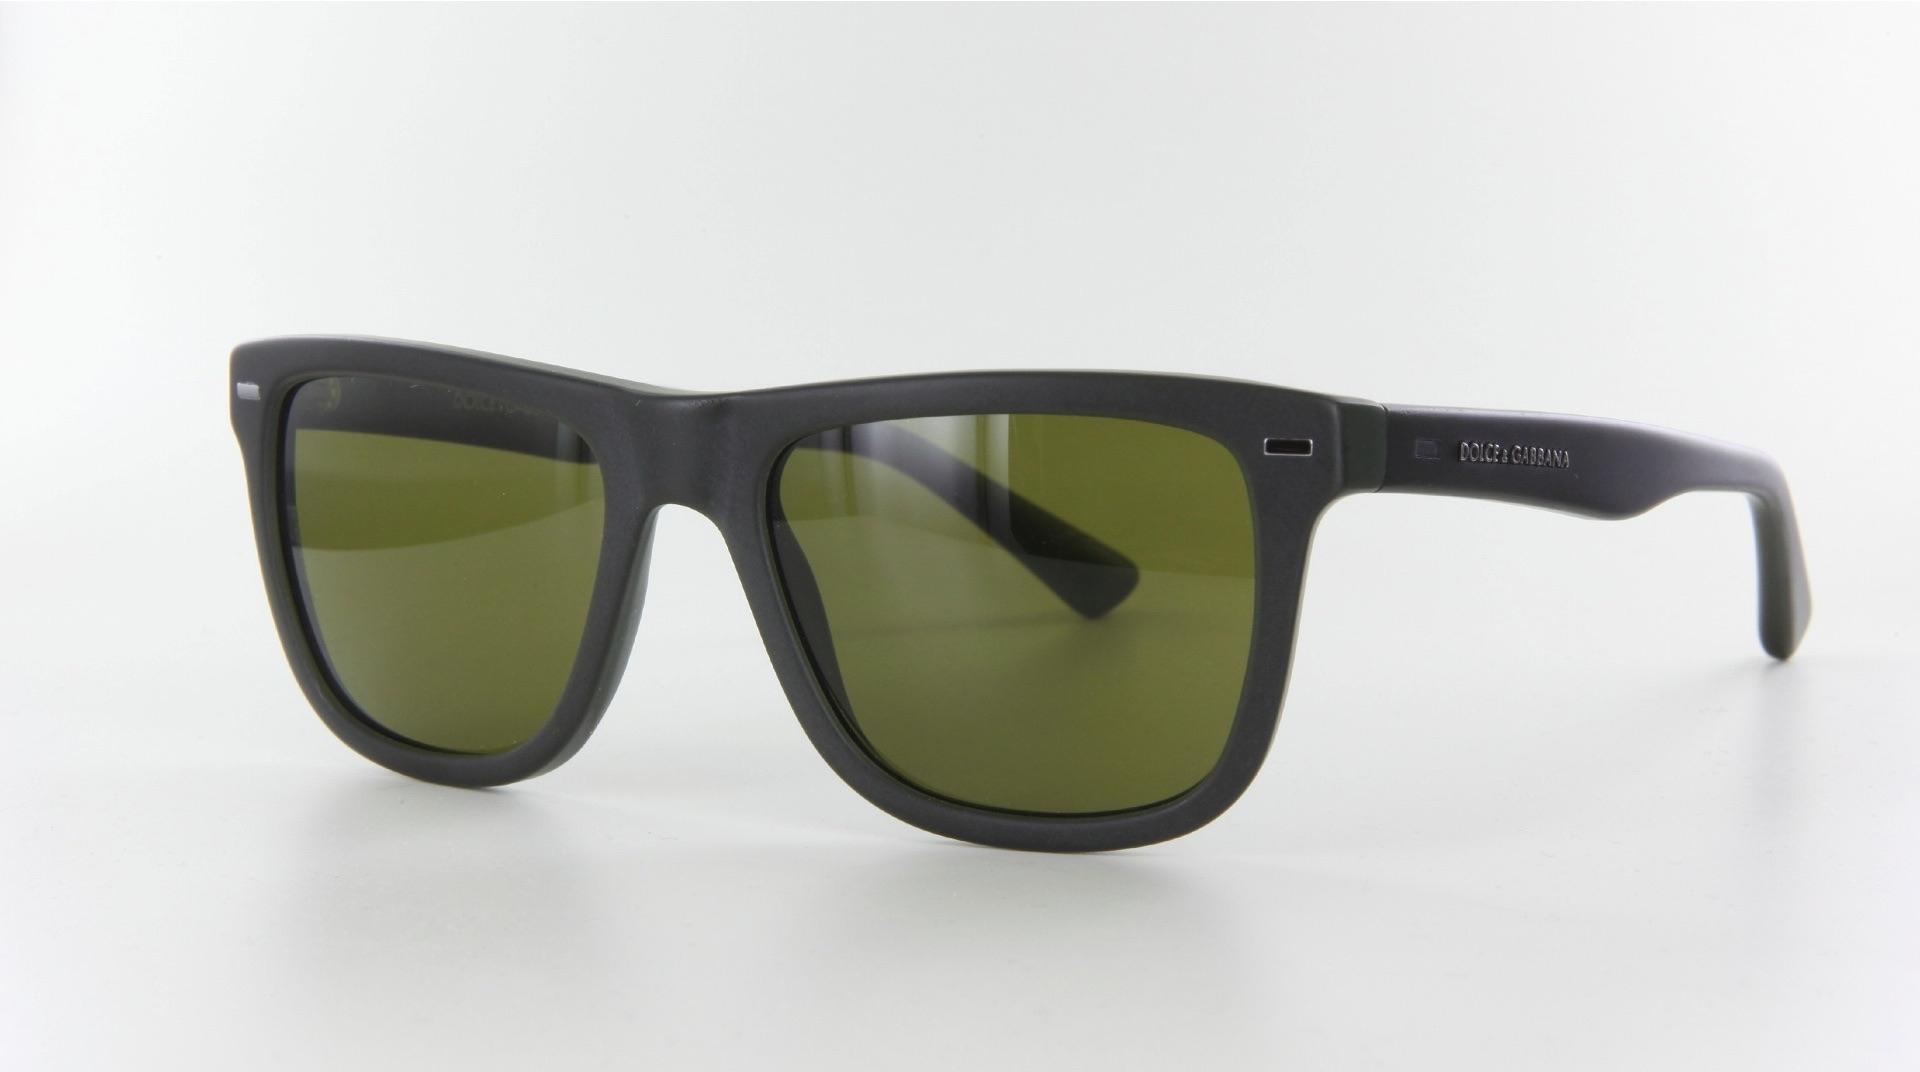 Dolce & Gabbana - ref: 72091